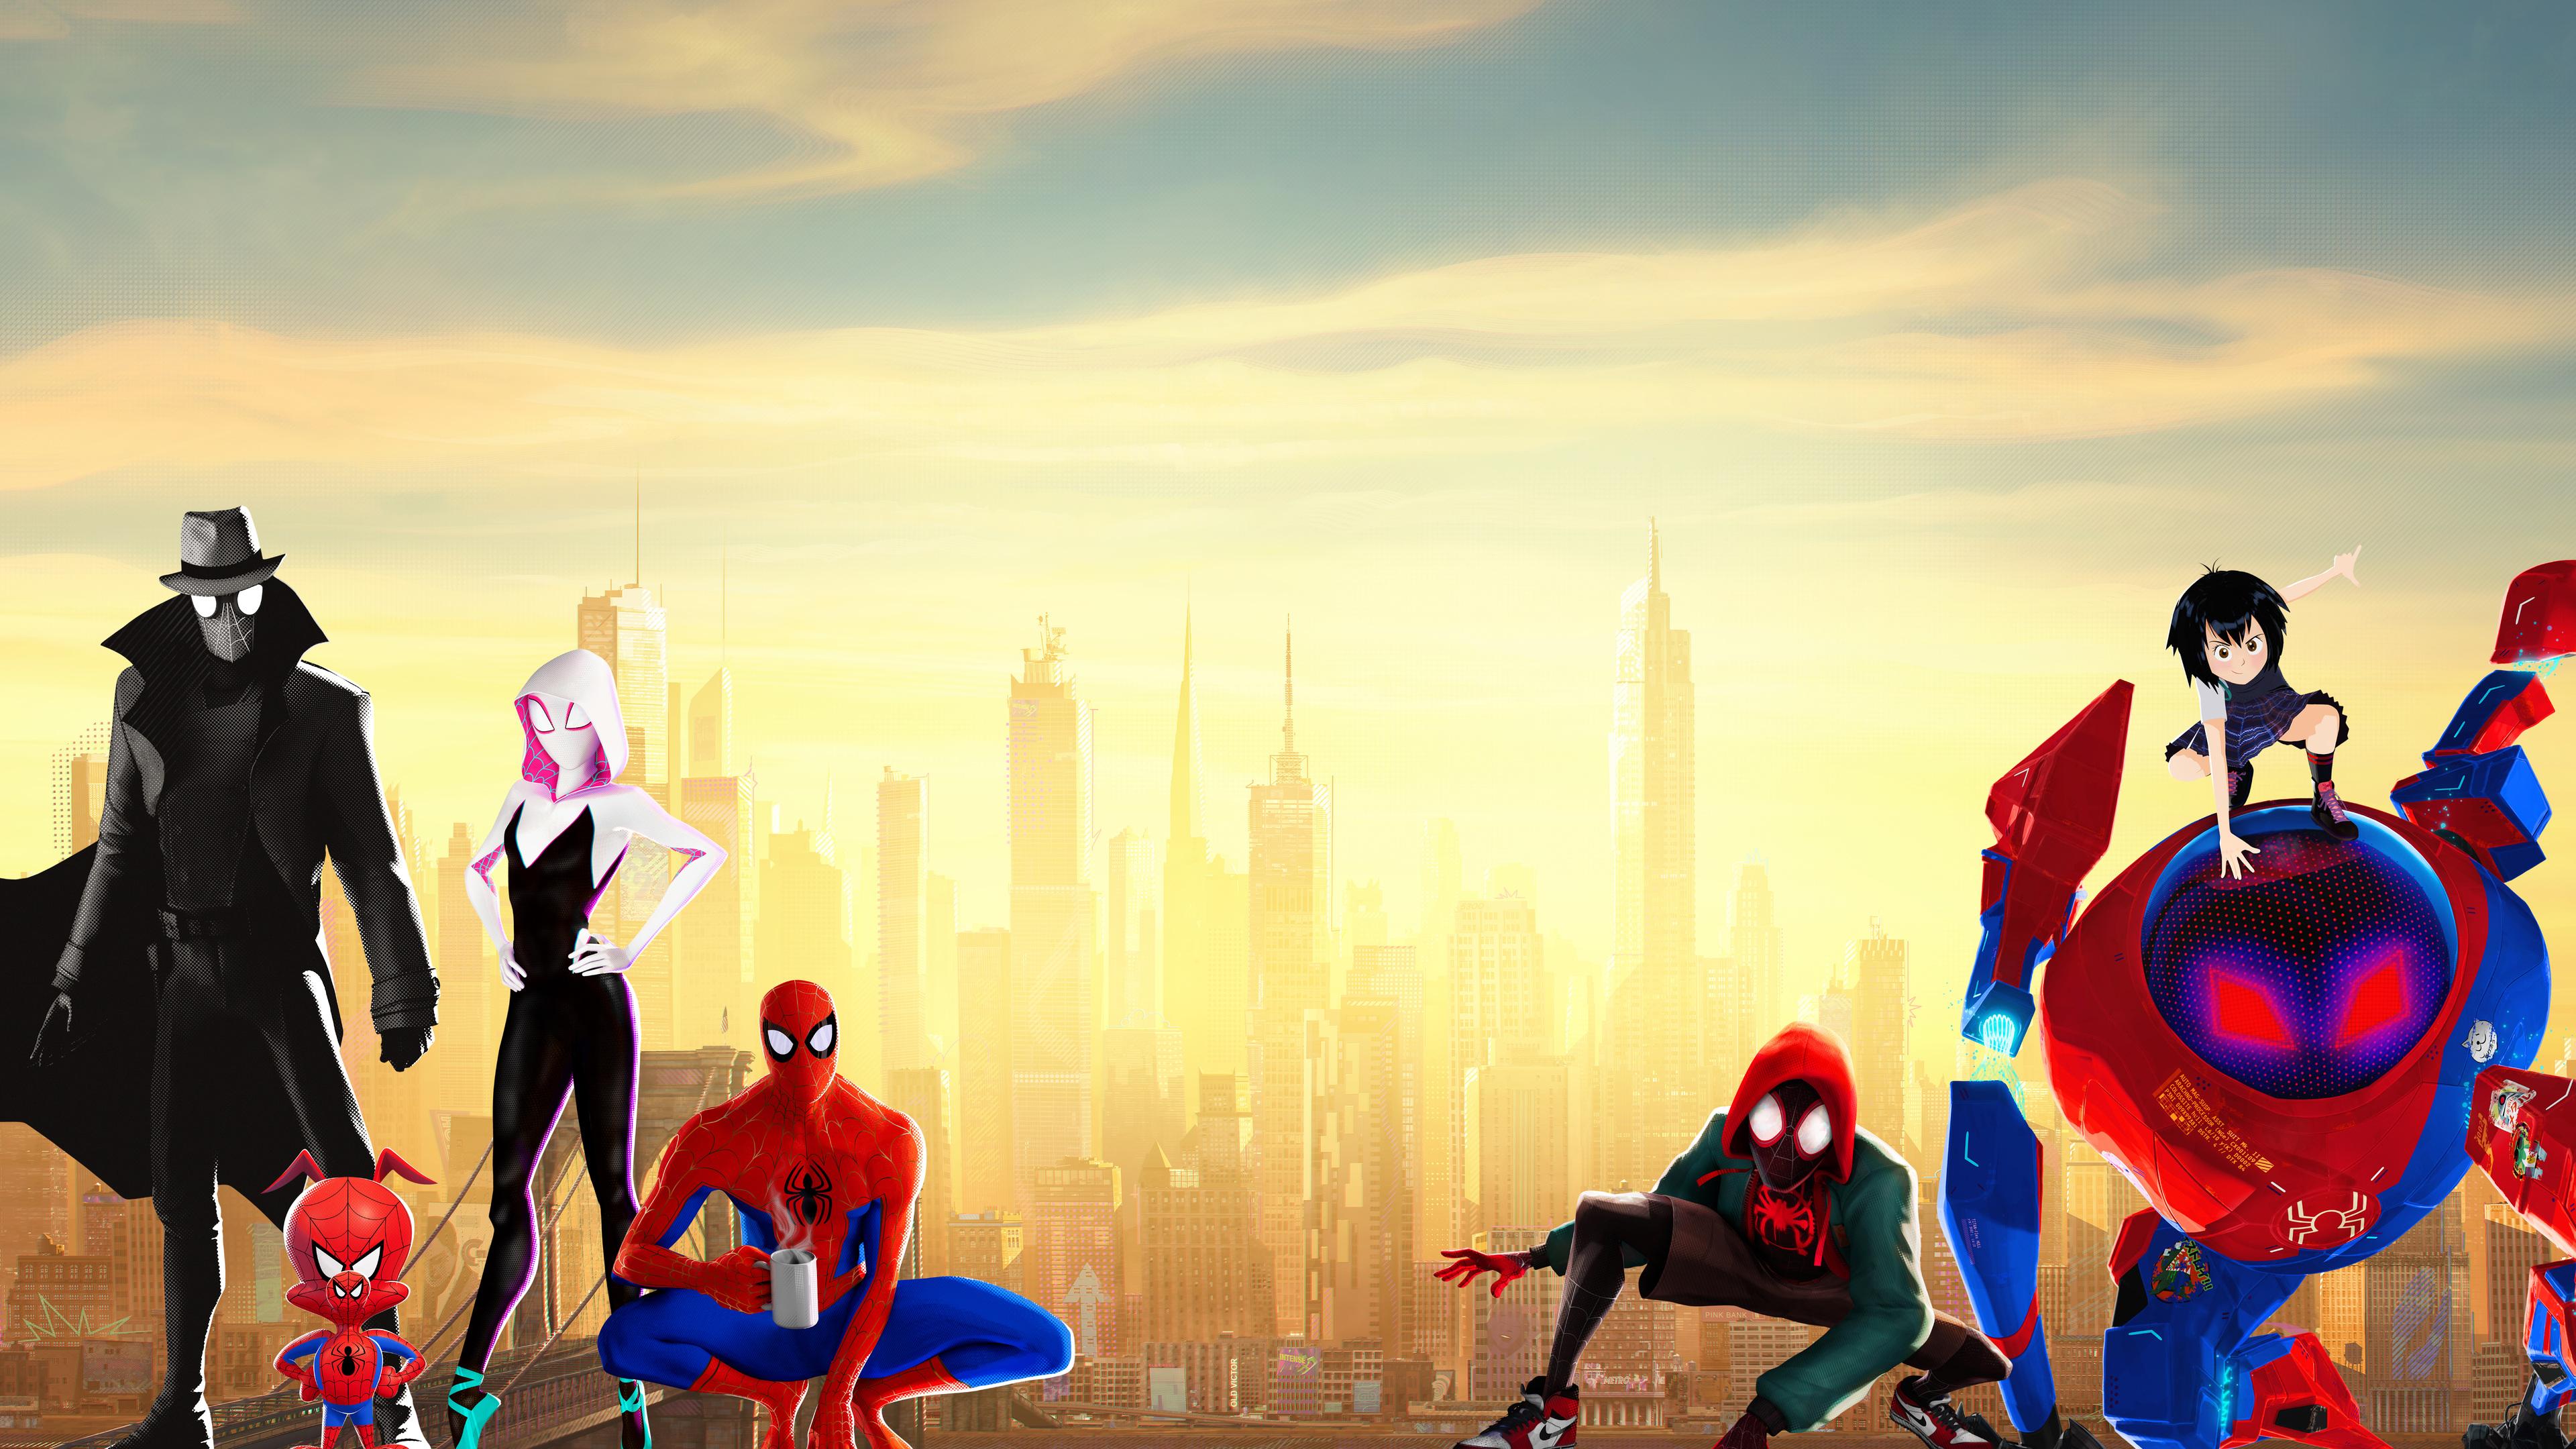 Wallpaper 4k Spiderman Into The Spider Verse 4k 10k Wallpapers